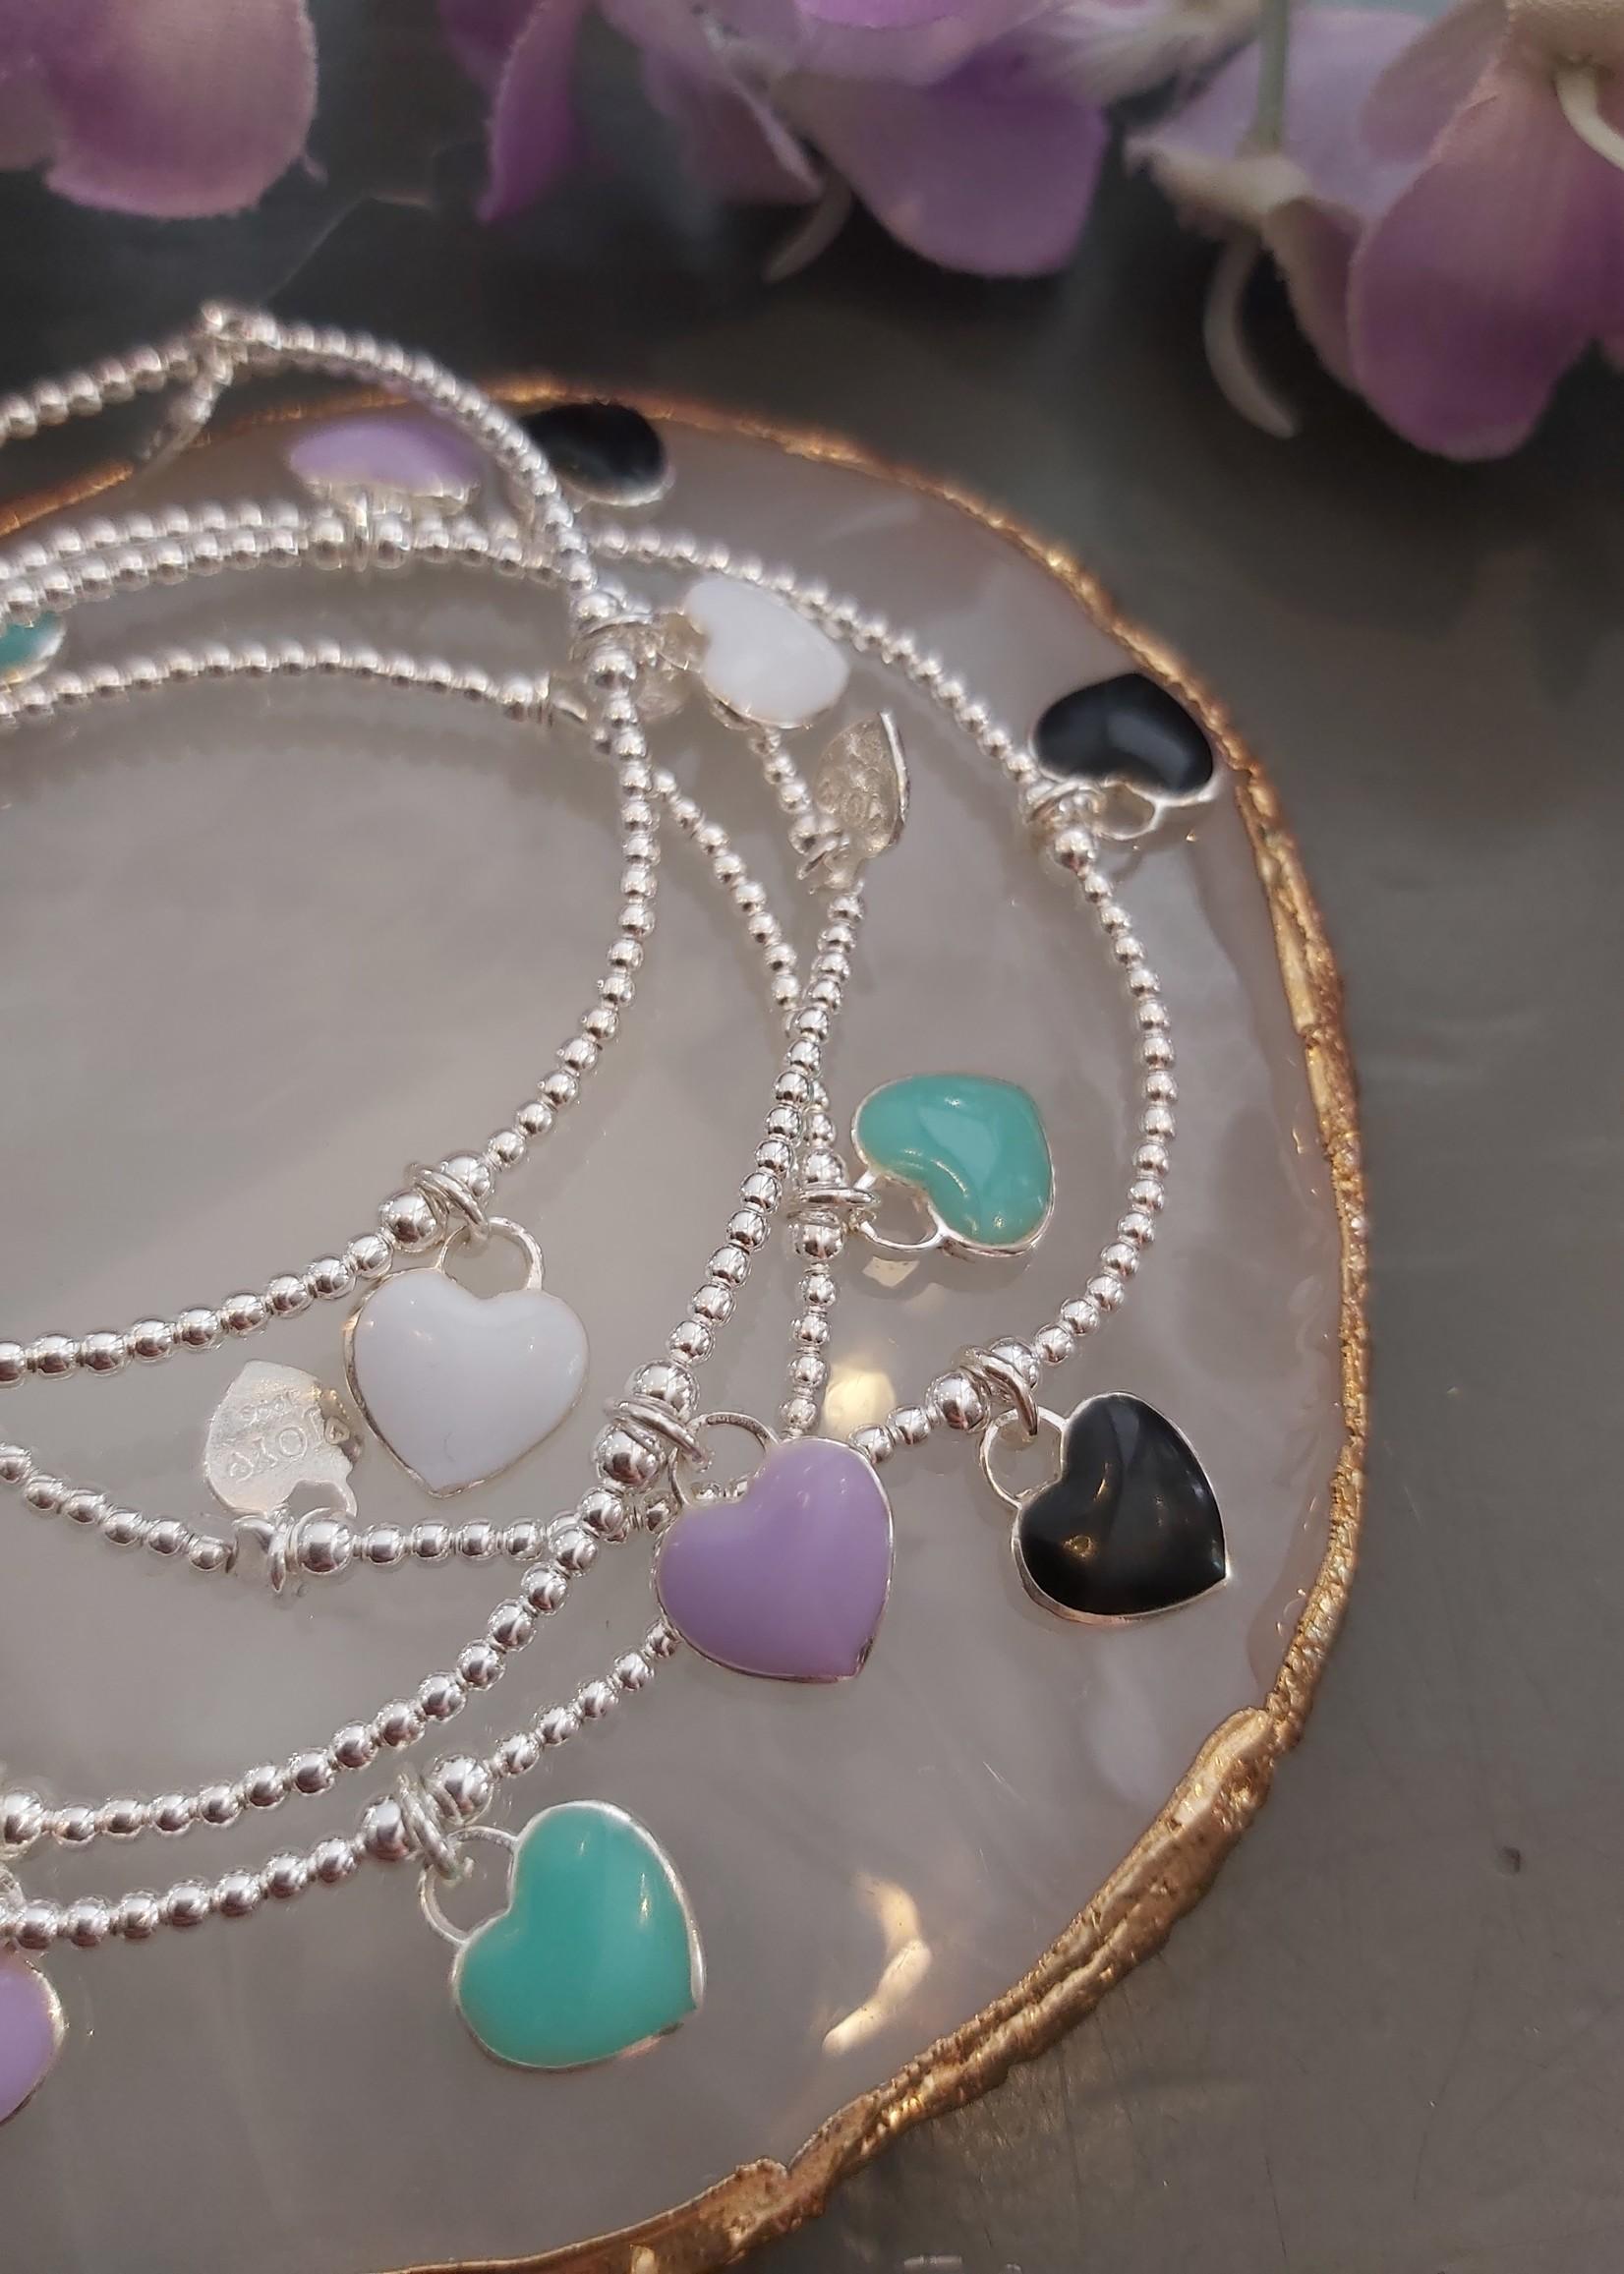 Joy Bali JOY armband No 5 Resin hearts - zwart